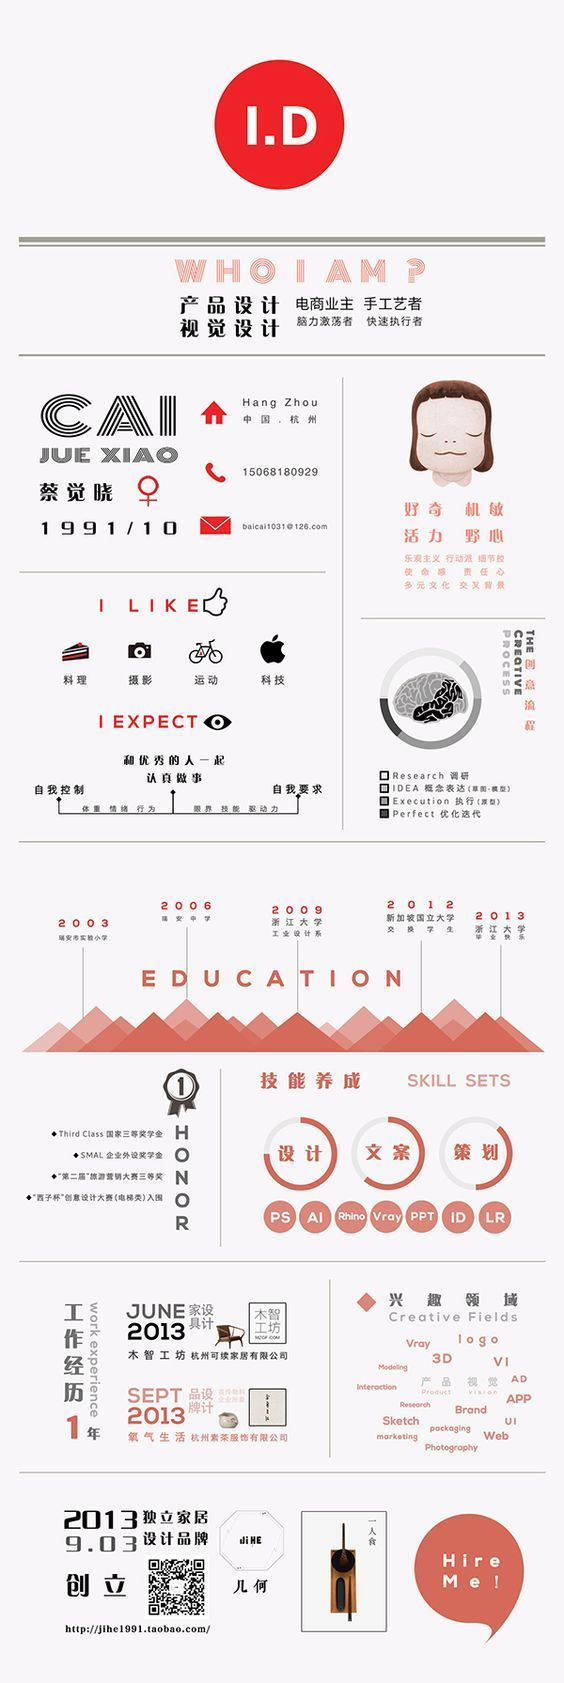 Resume 简历 on Behance: